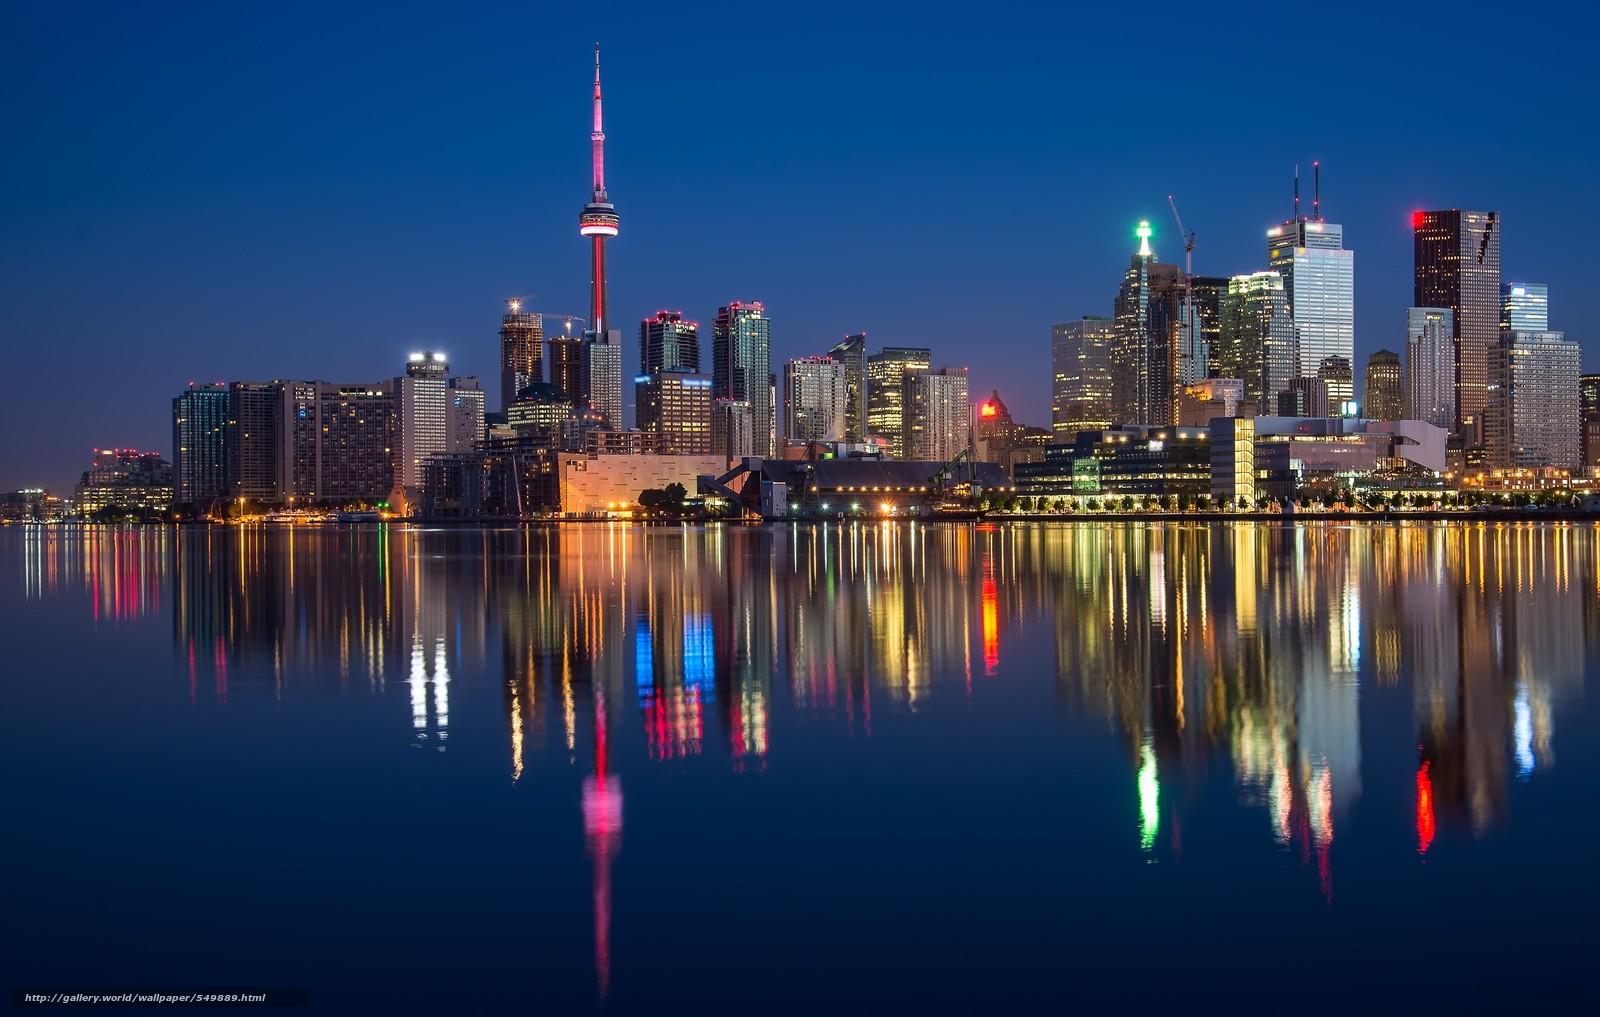 Download wallpaper Toronto Ontario Canada desktop wallpaper in 1600x1017